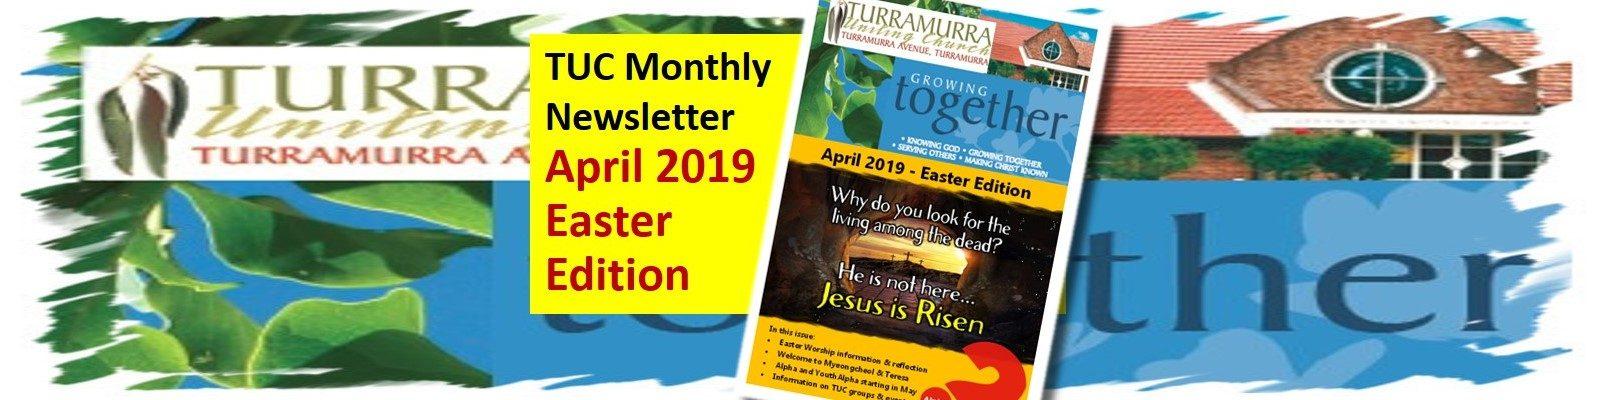 April 2019 Newsletter - Easter Edition